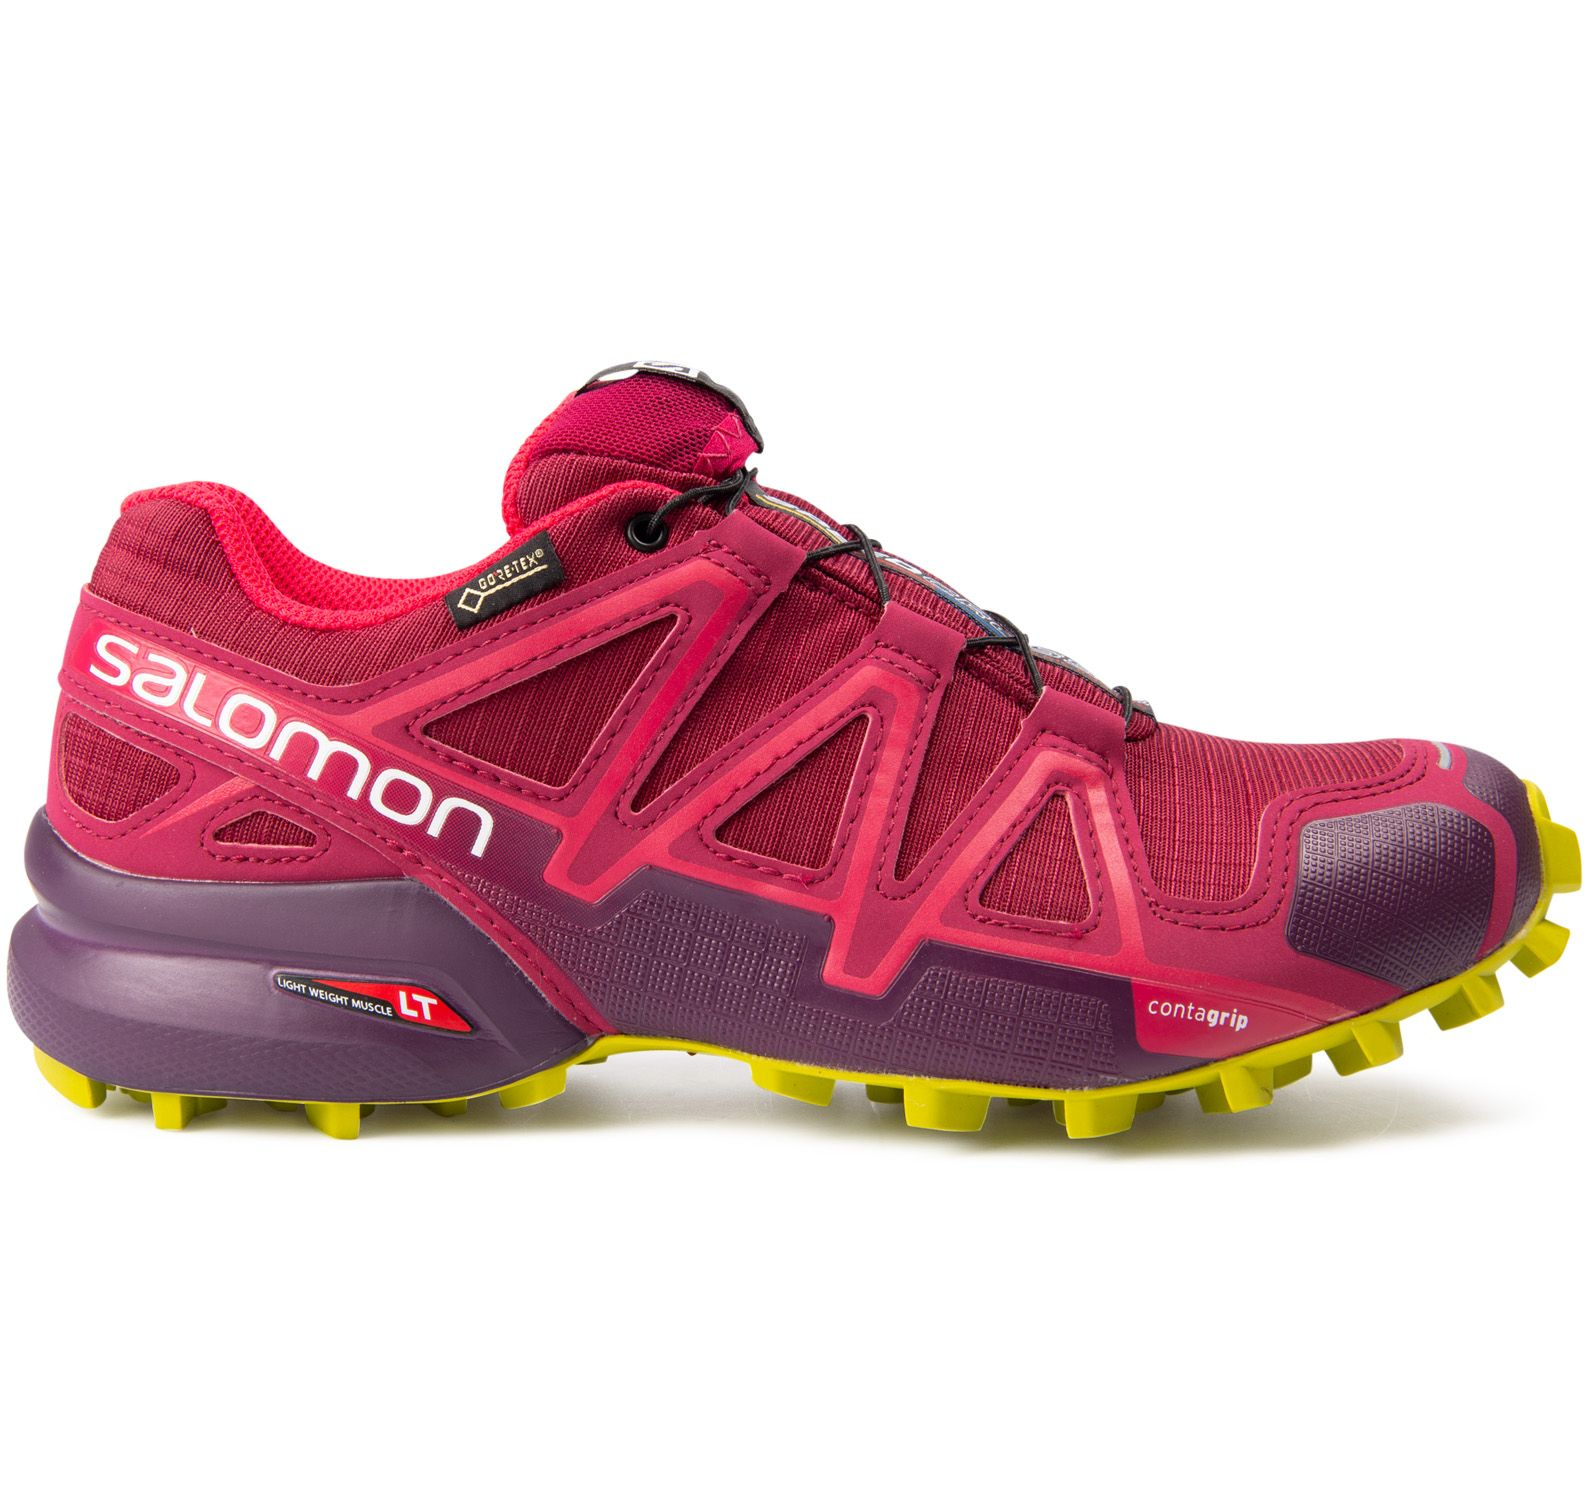 speedcross 4 gtx® w, beetred/potentpurple/citronell, 38